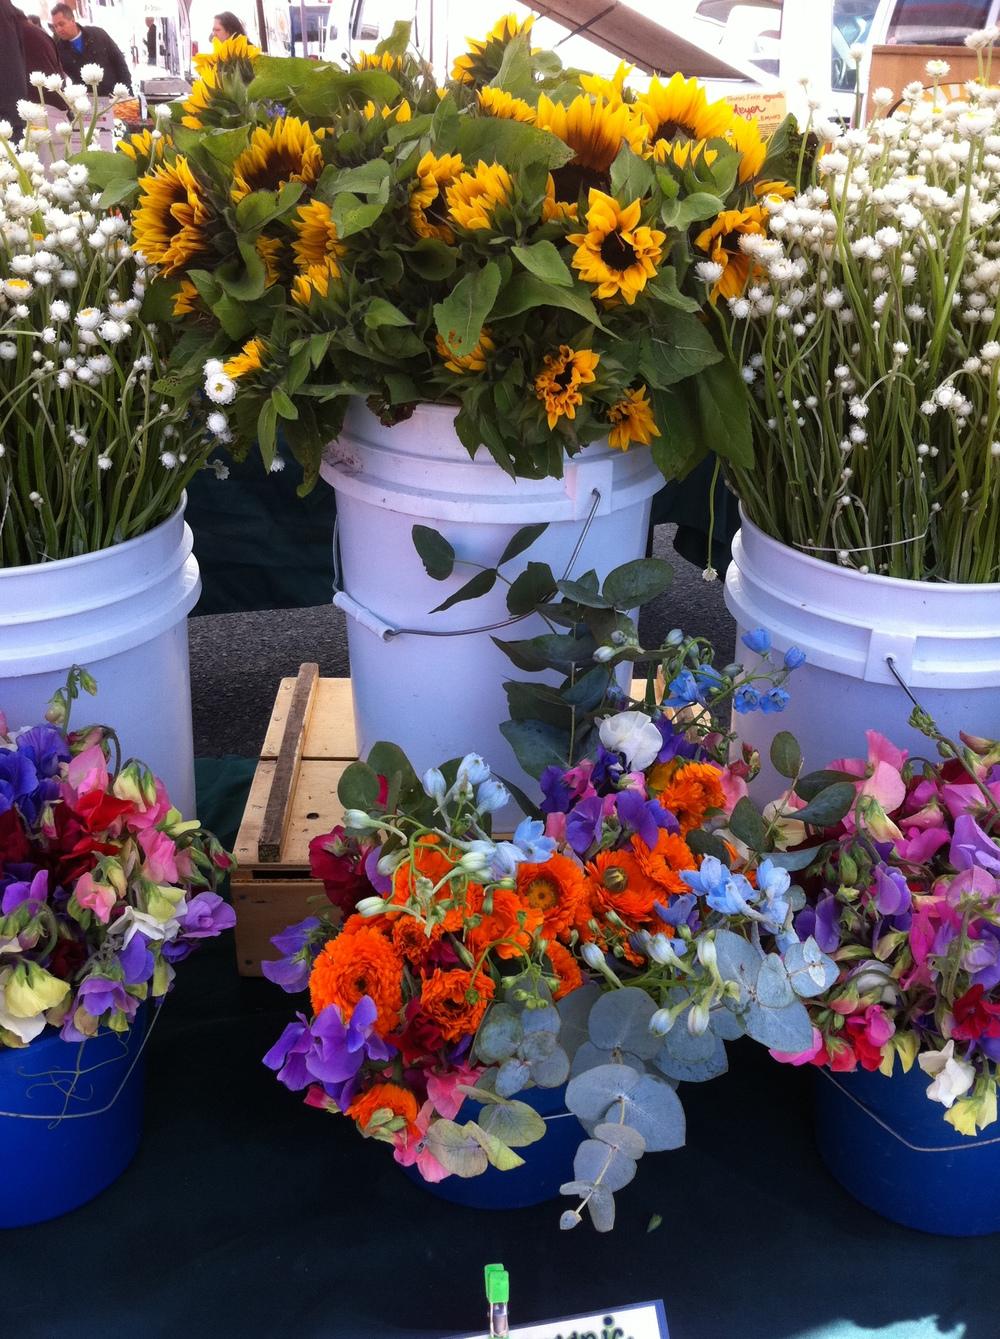 flowers - fmc photo2.JPG